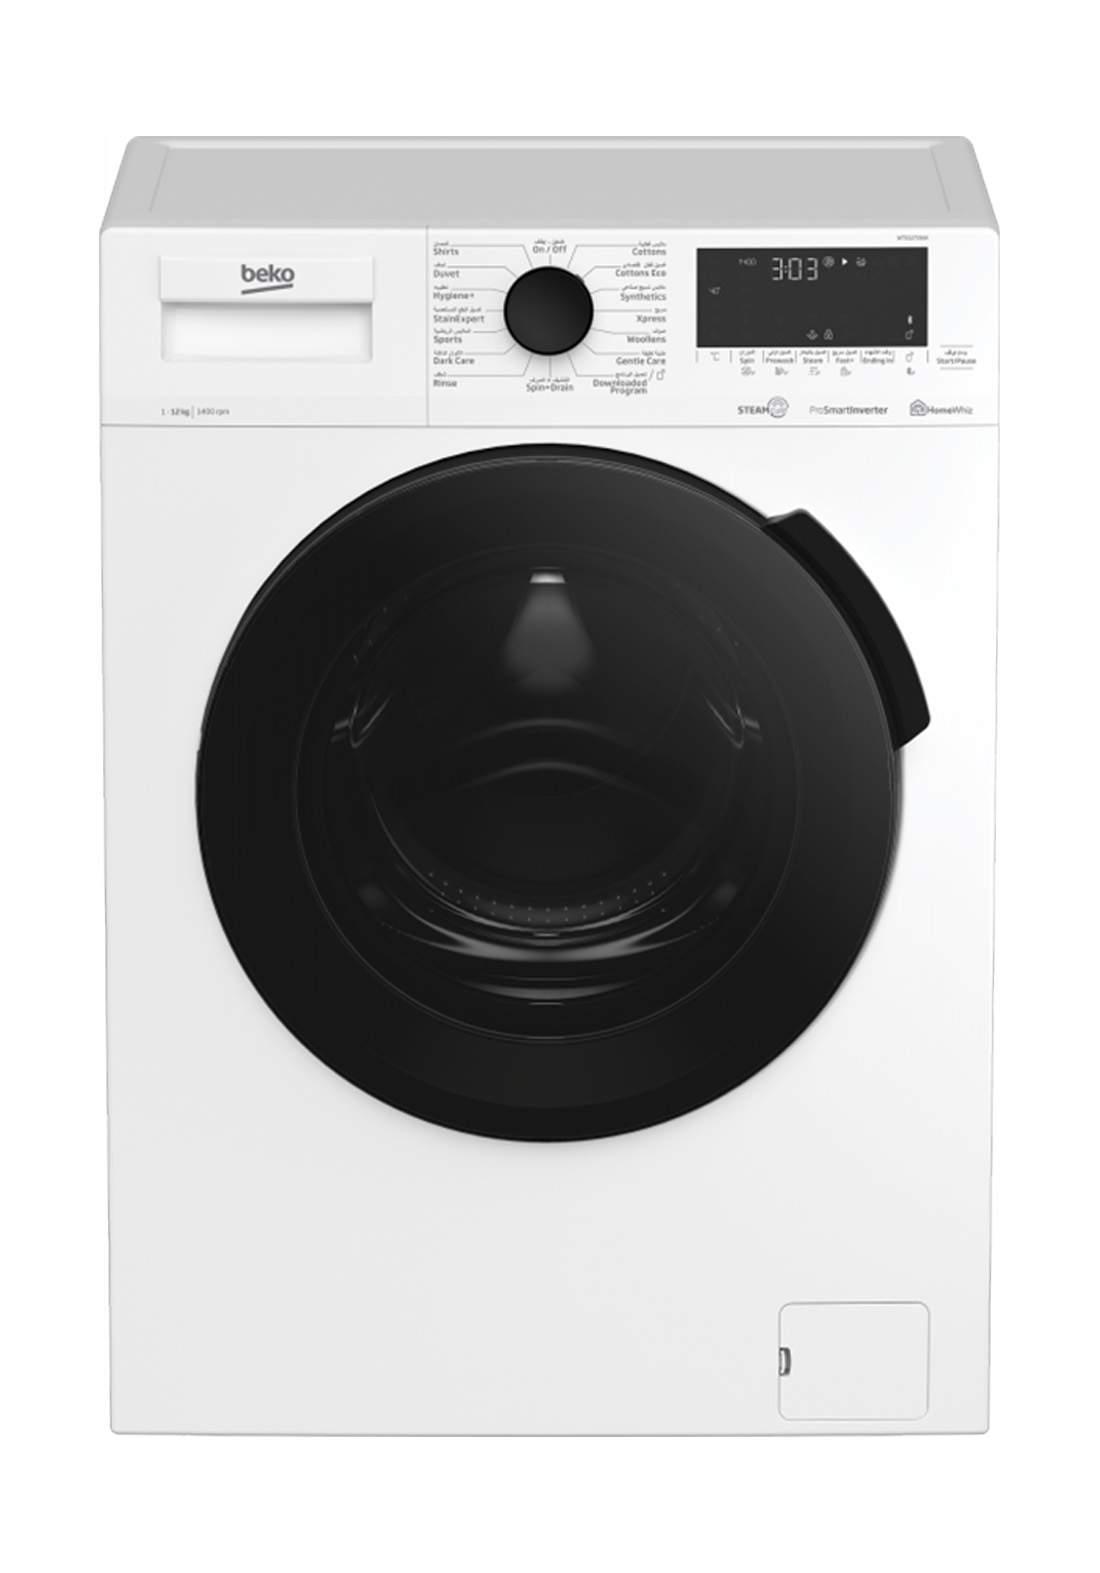 Beko WTE12726W Freestanding Washing Machine 12 kg - White غسالة أوتماتيك